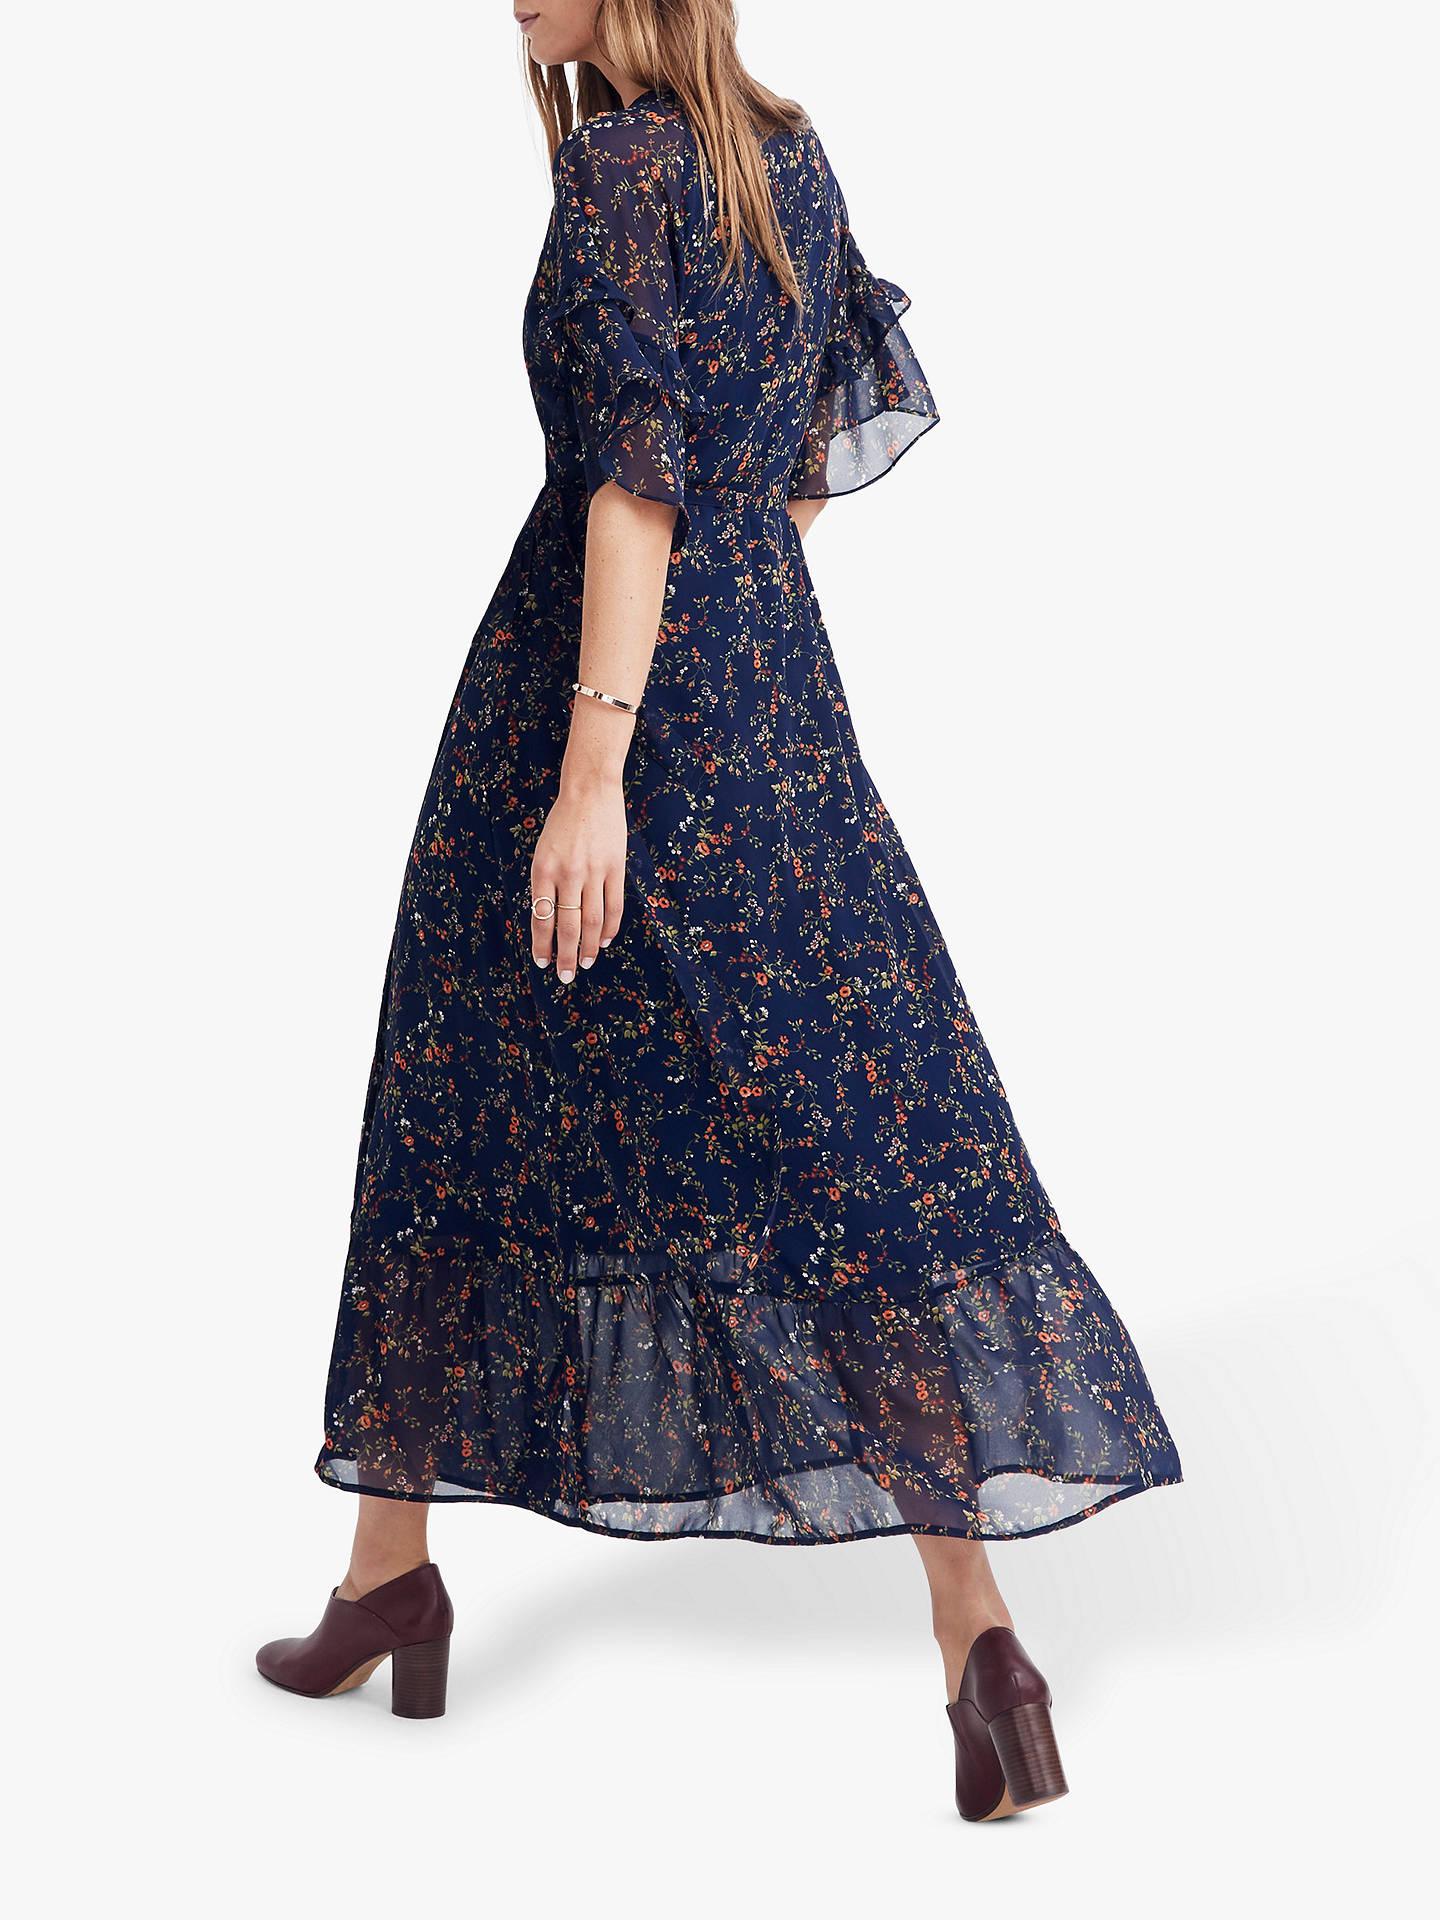 ee832fe2b00 Buy Madewell Ruffle Wrap Tie Dress